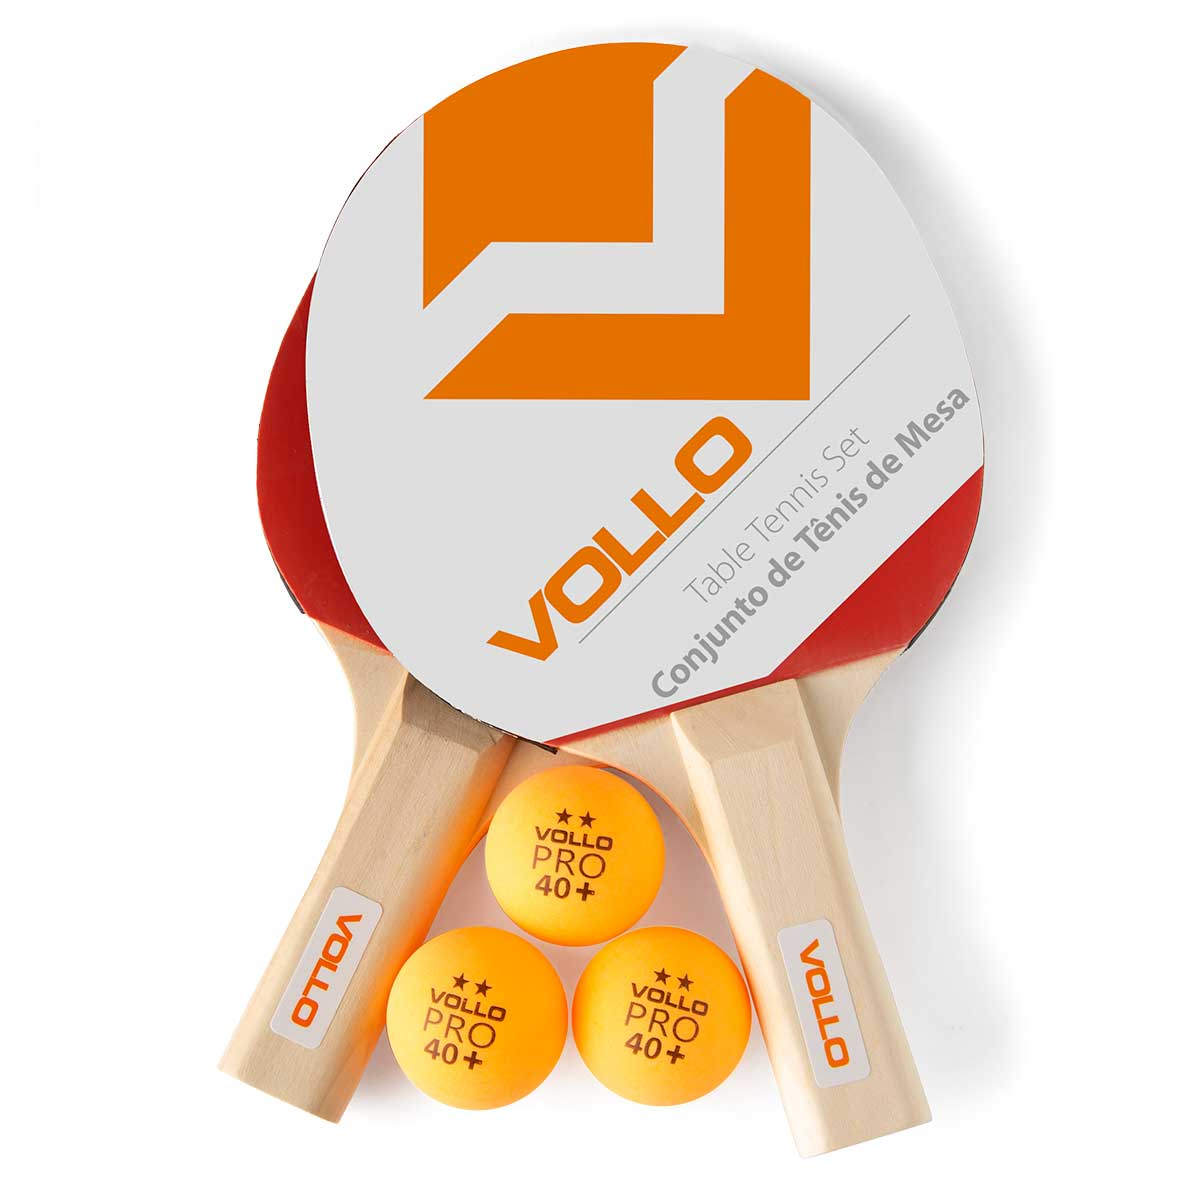 Kit Tênis de Mesa Vollo 2 Raquetes 3 Bolas